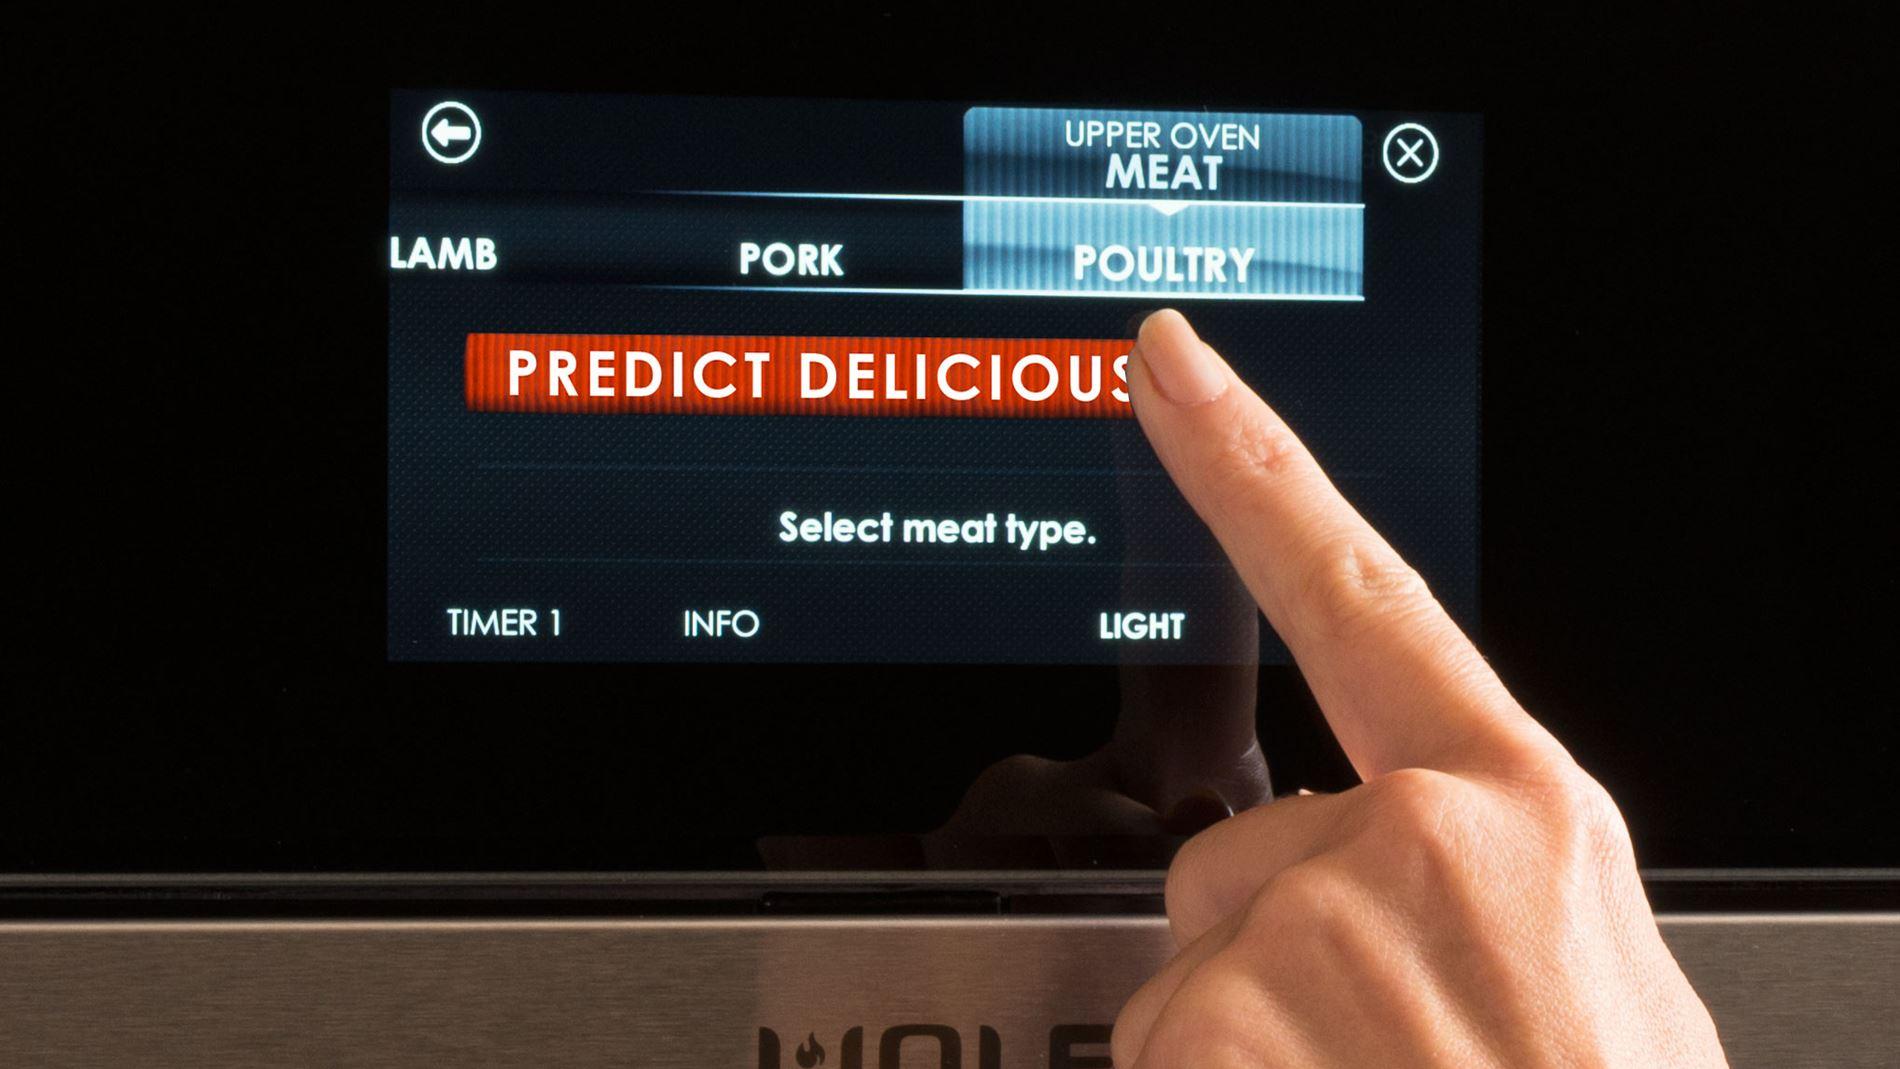 m_series_oven_controls_predictdelicious